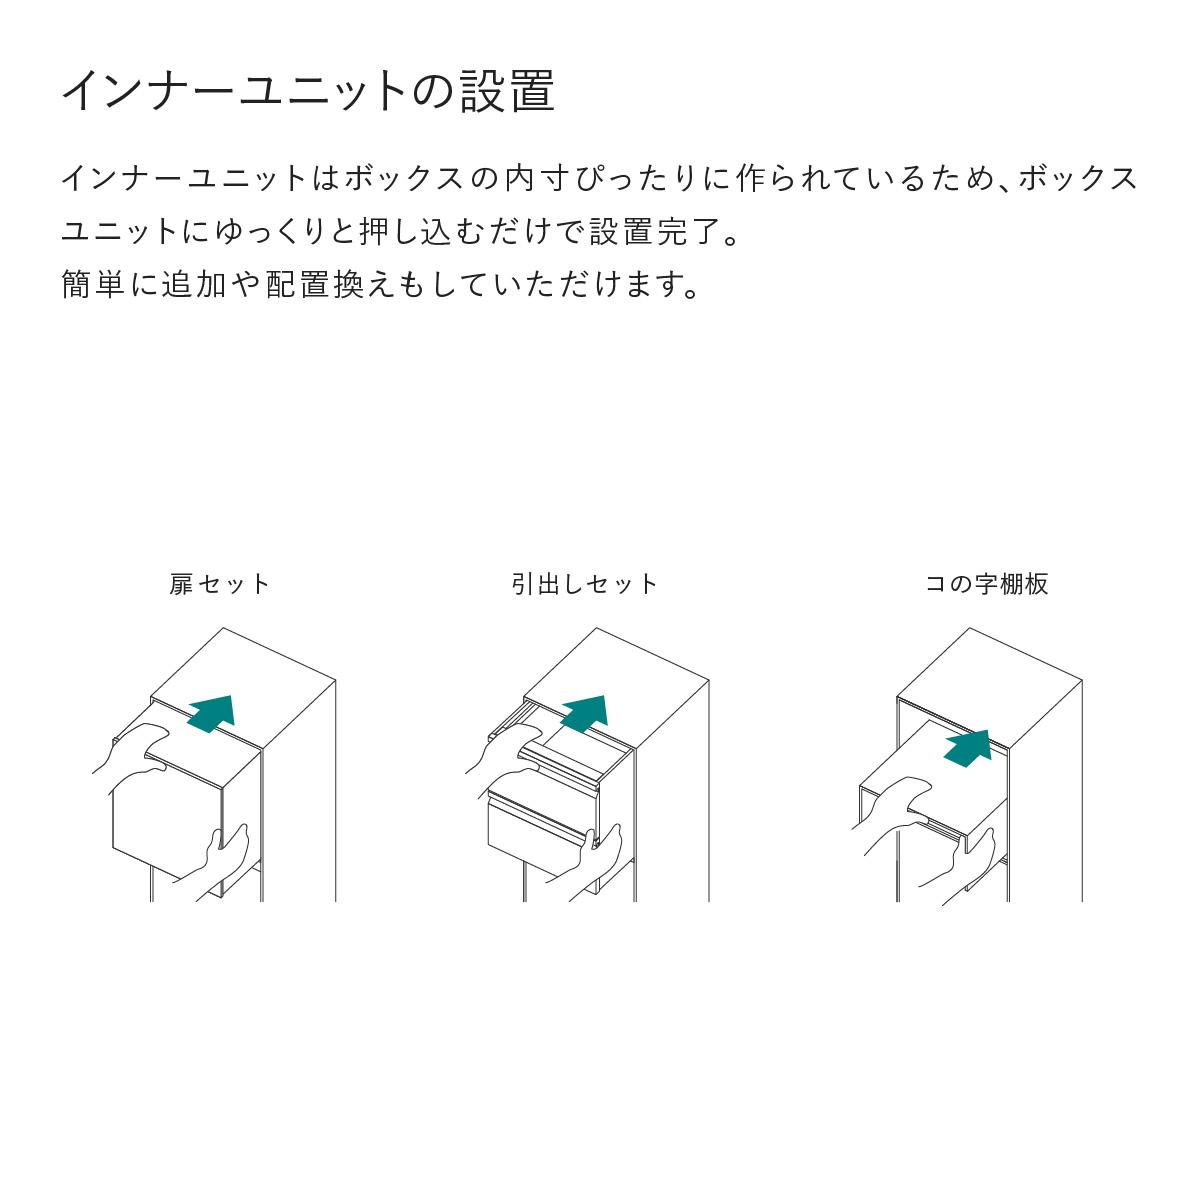 【V-TISS LIGHT  Set Plan-B】 ボックスユニットと脚による、高低差を楽しむサイドボード